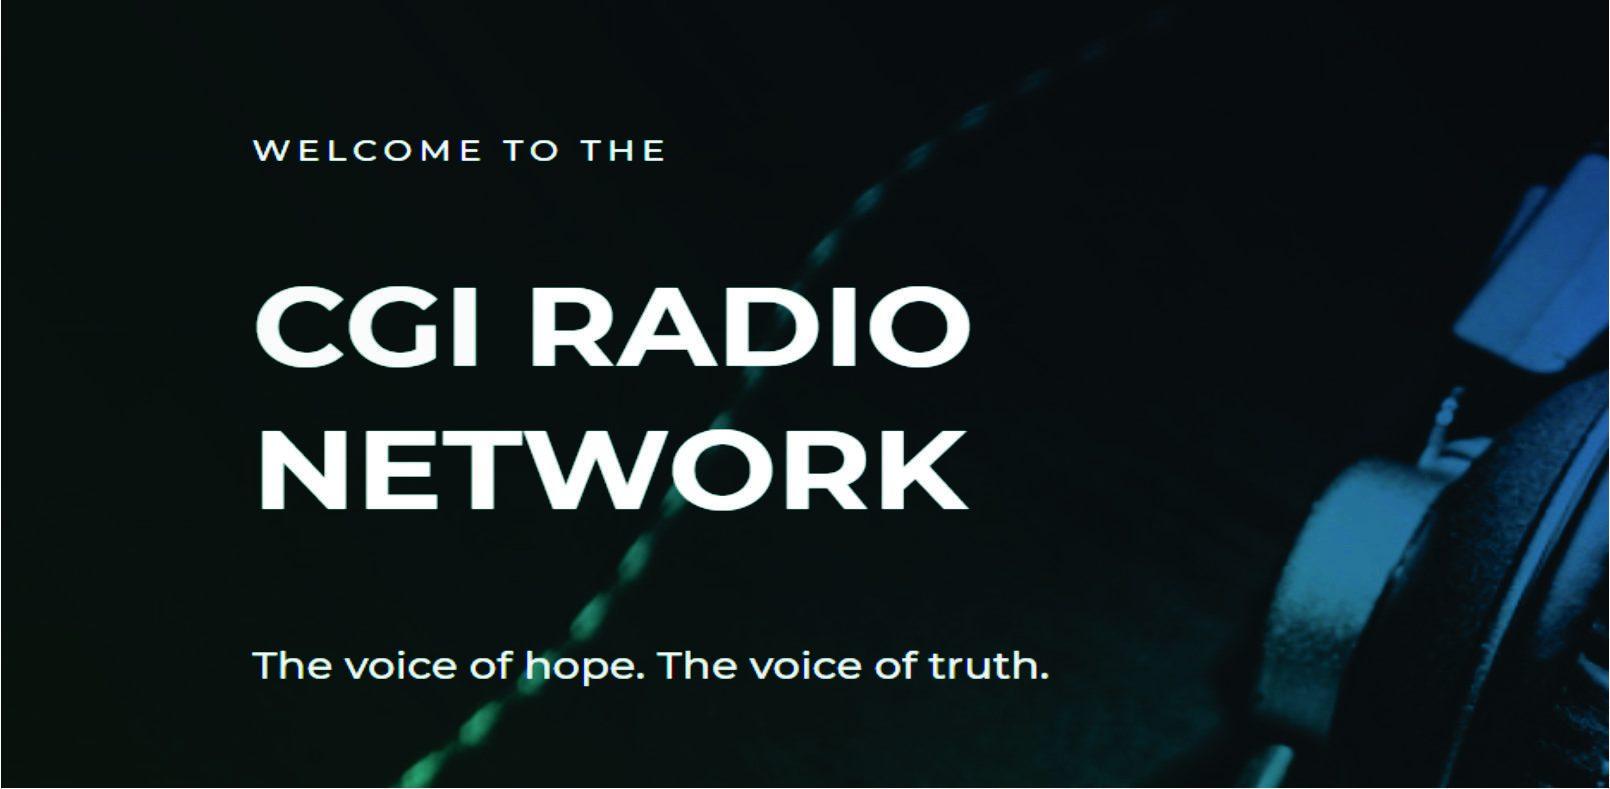 CGI Radio Network